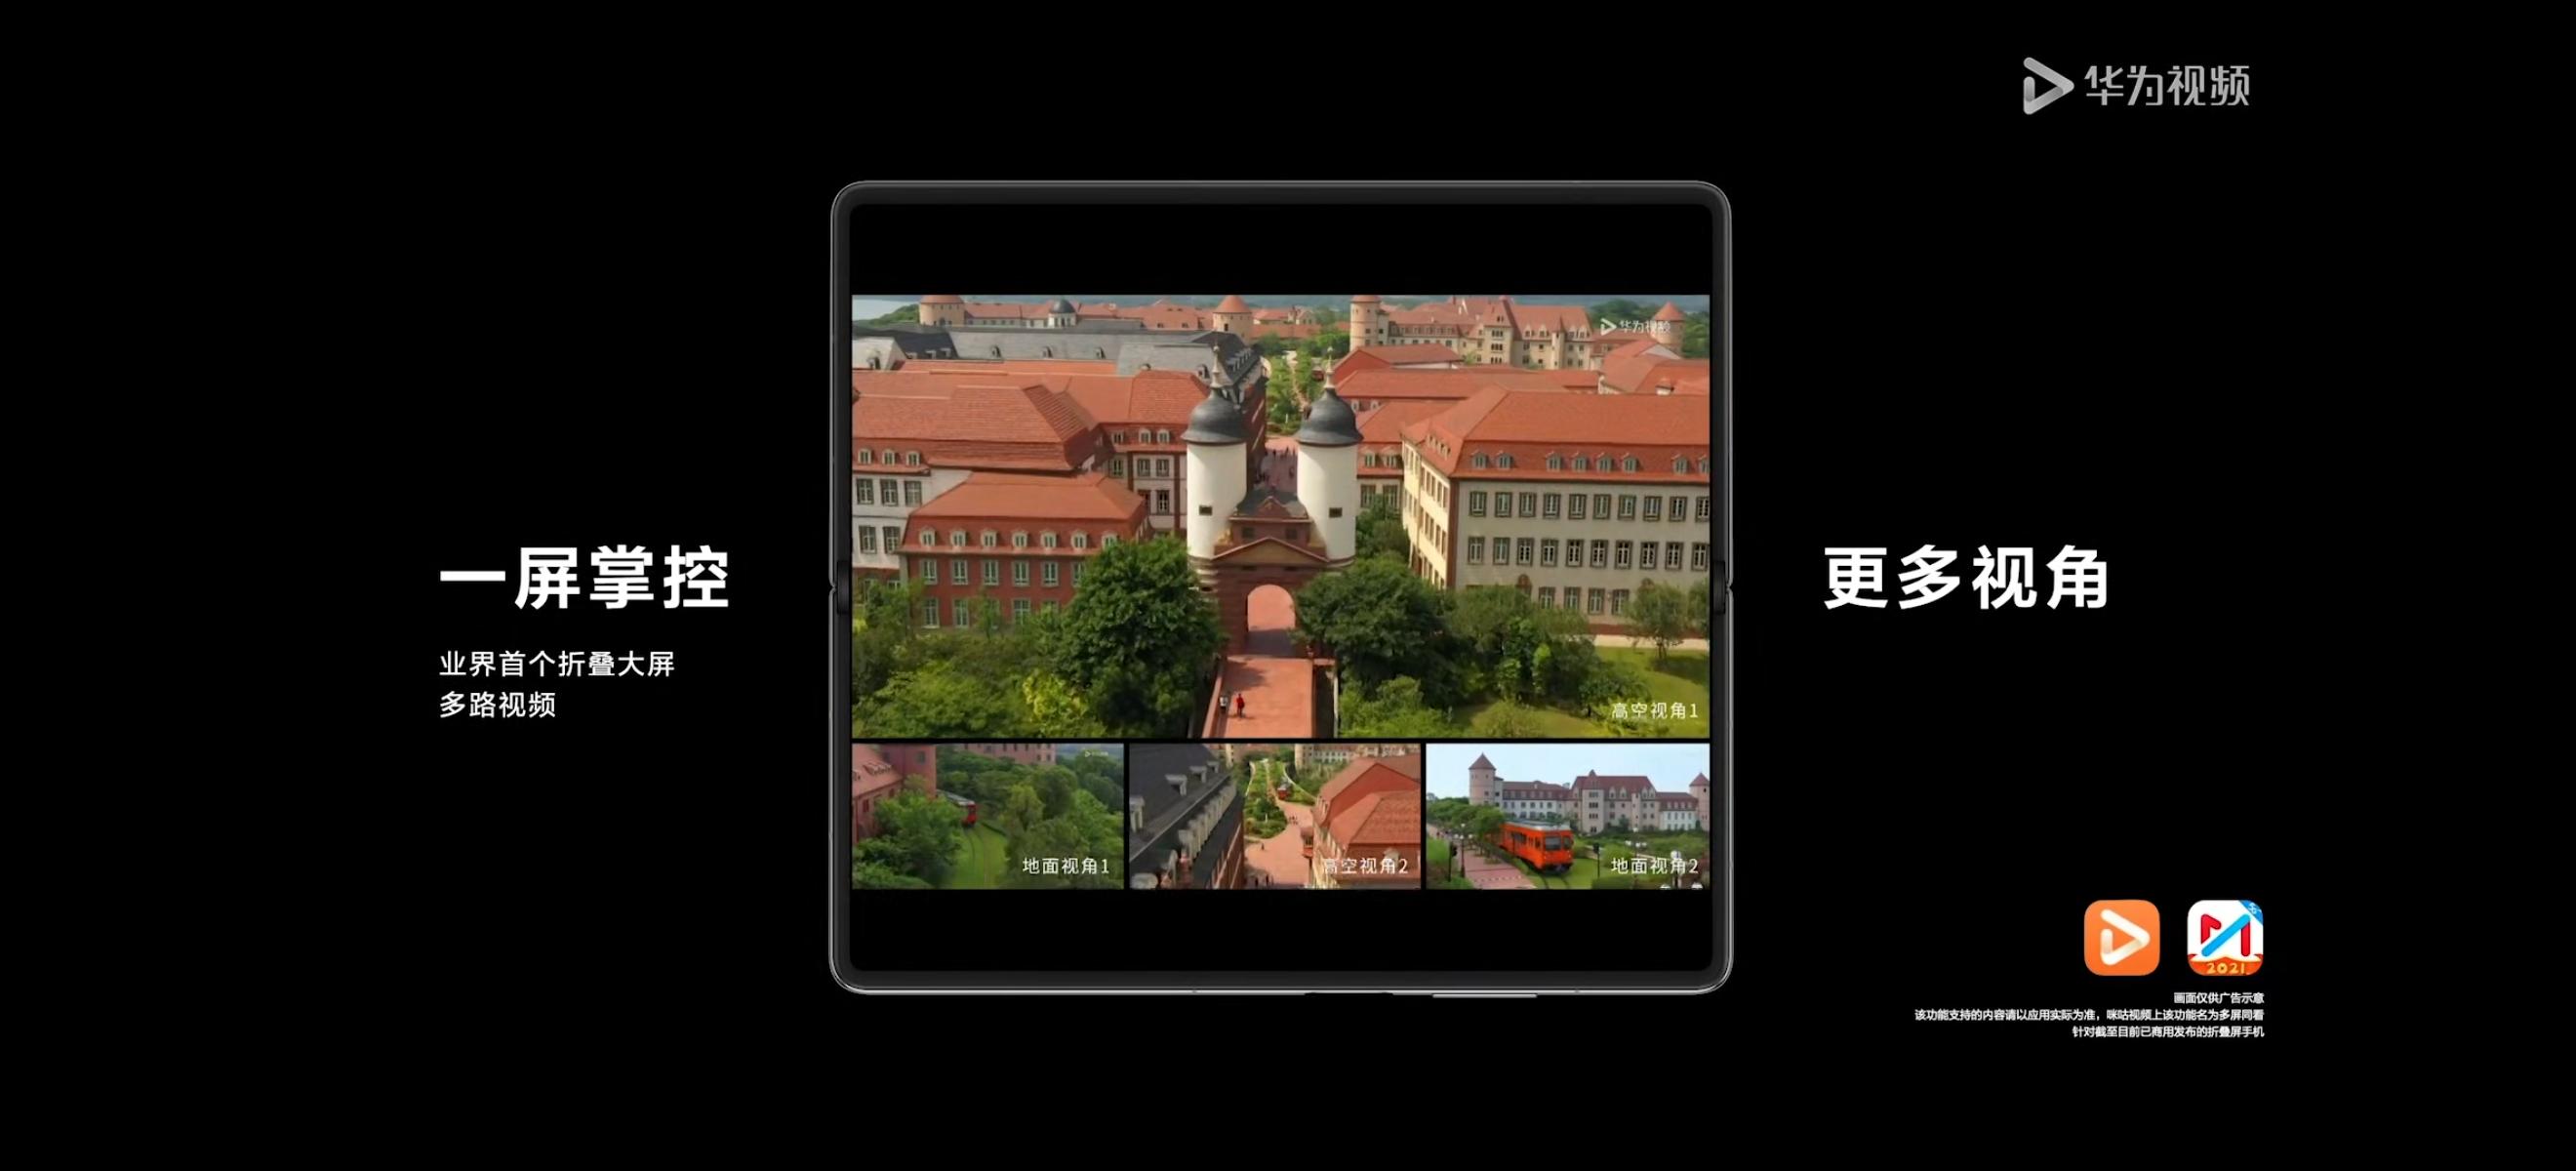 Screenshot_20210222_202048_com.huawei.himovie.jpg